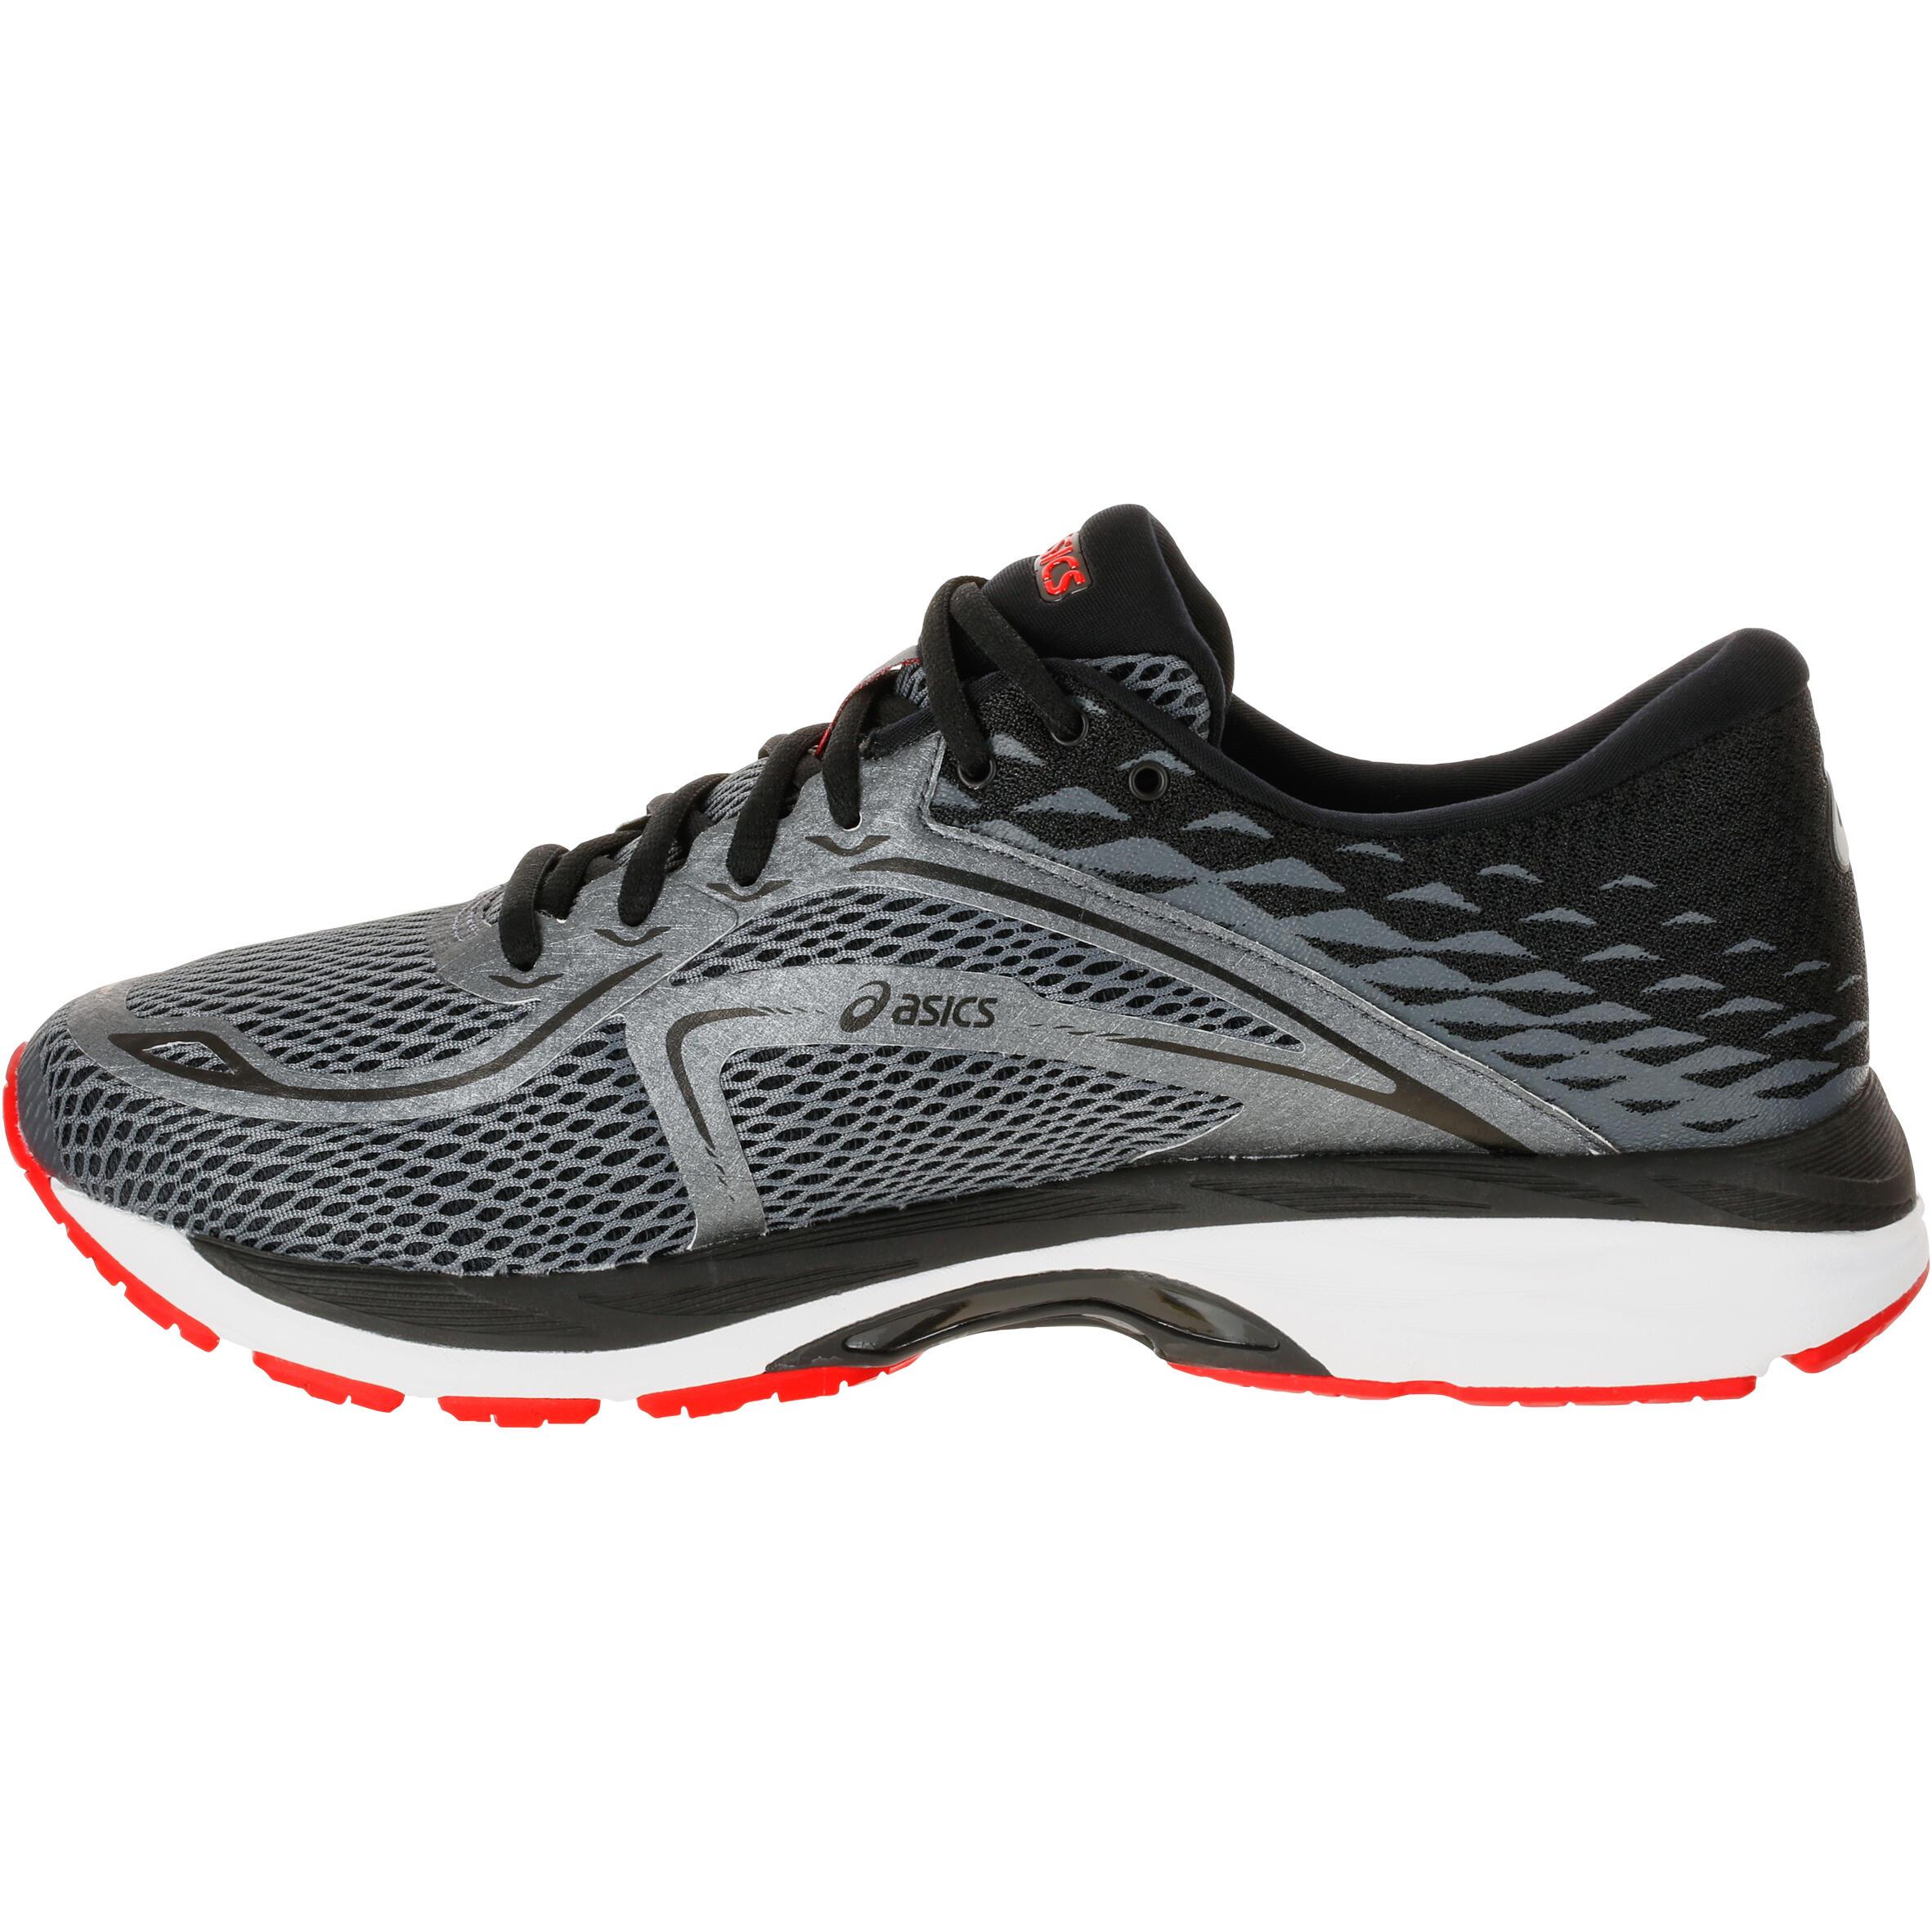 chaussures running asics gel cumulus 19 homme rouge asics